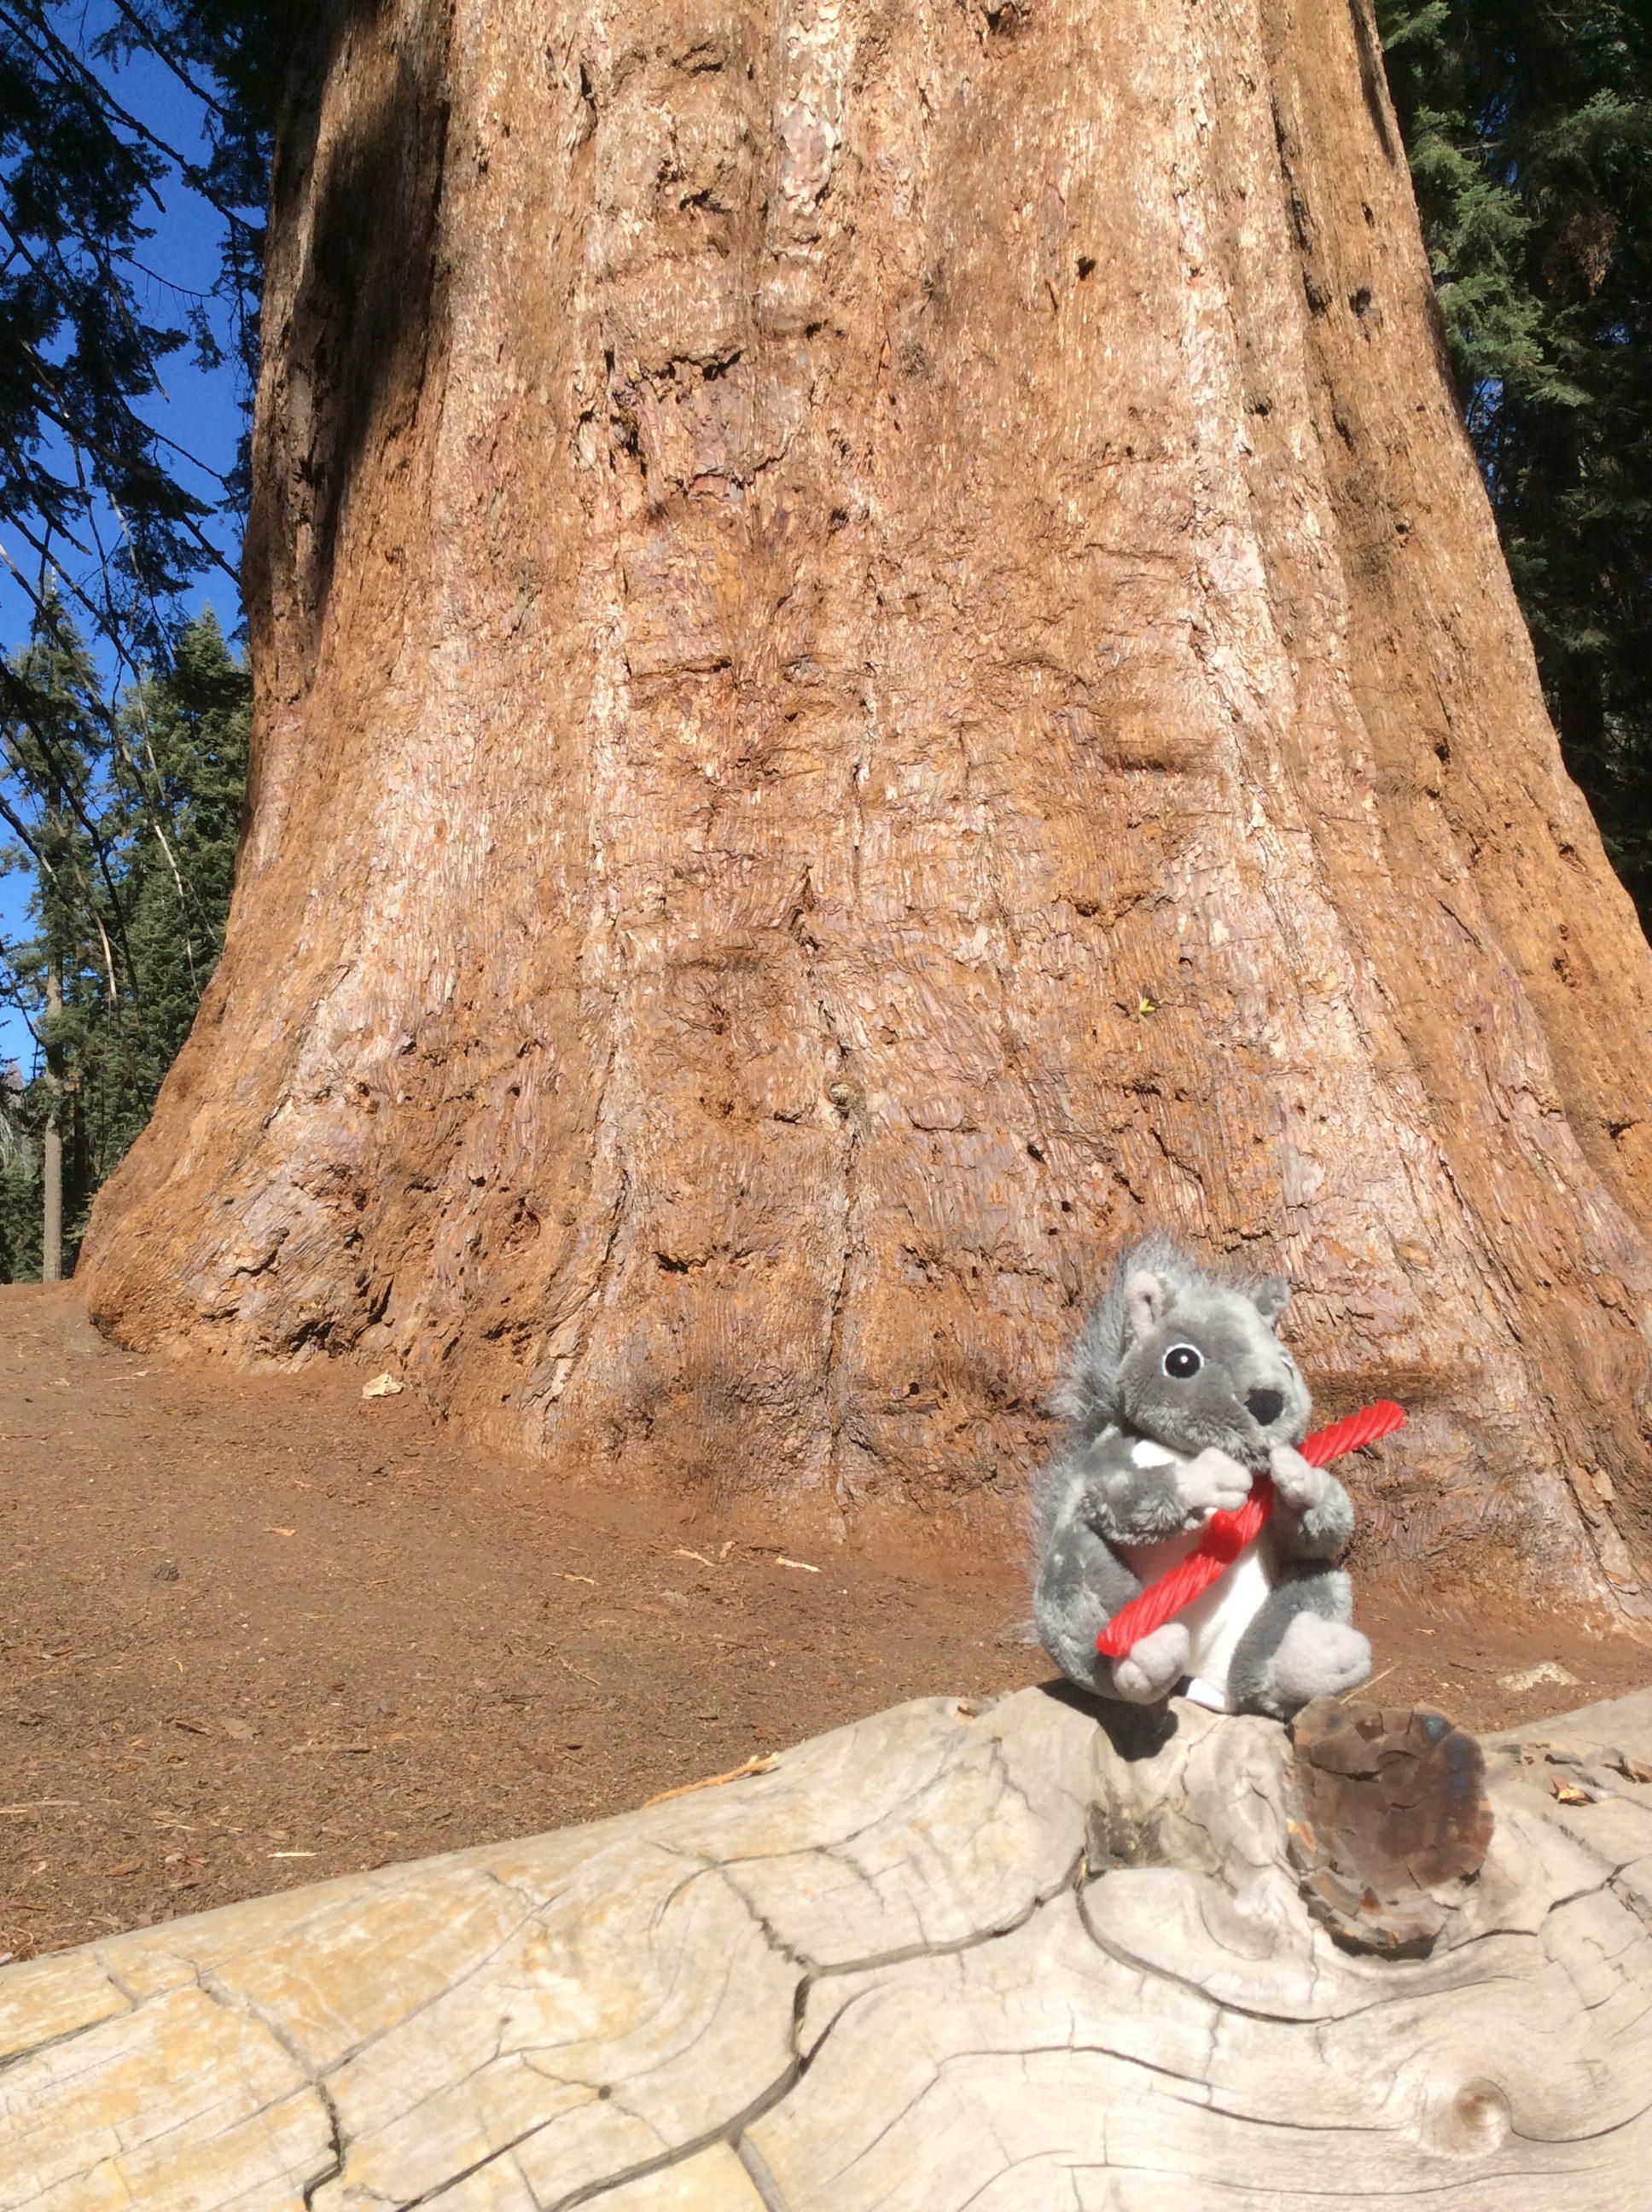 Our new Mascot Spirou, Sequoia NP, Californie, USA